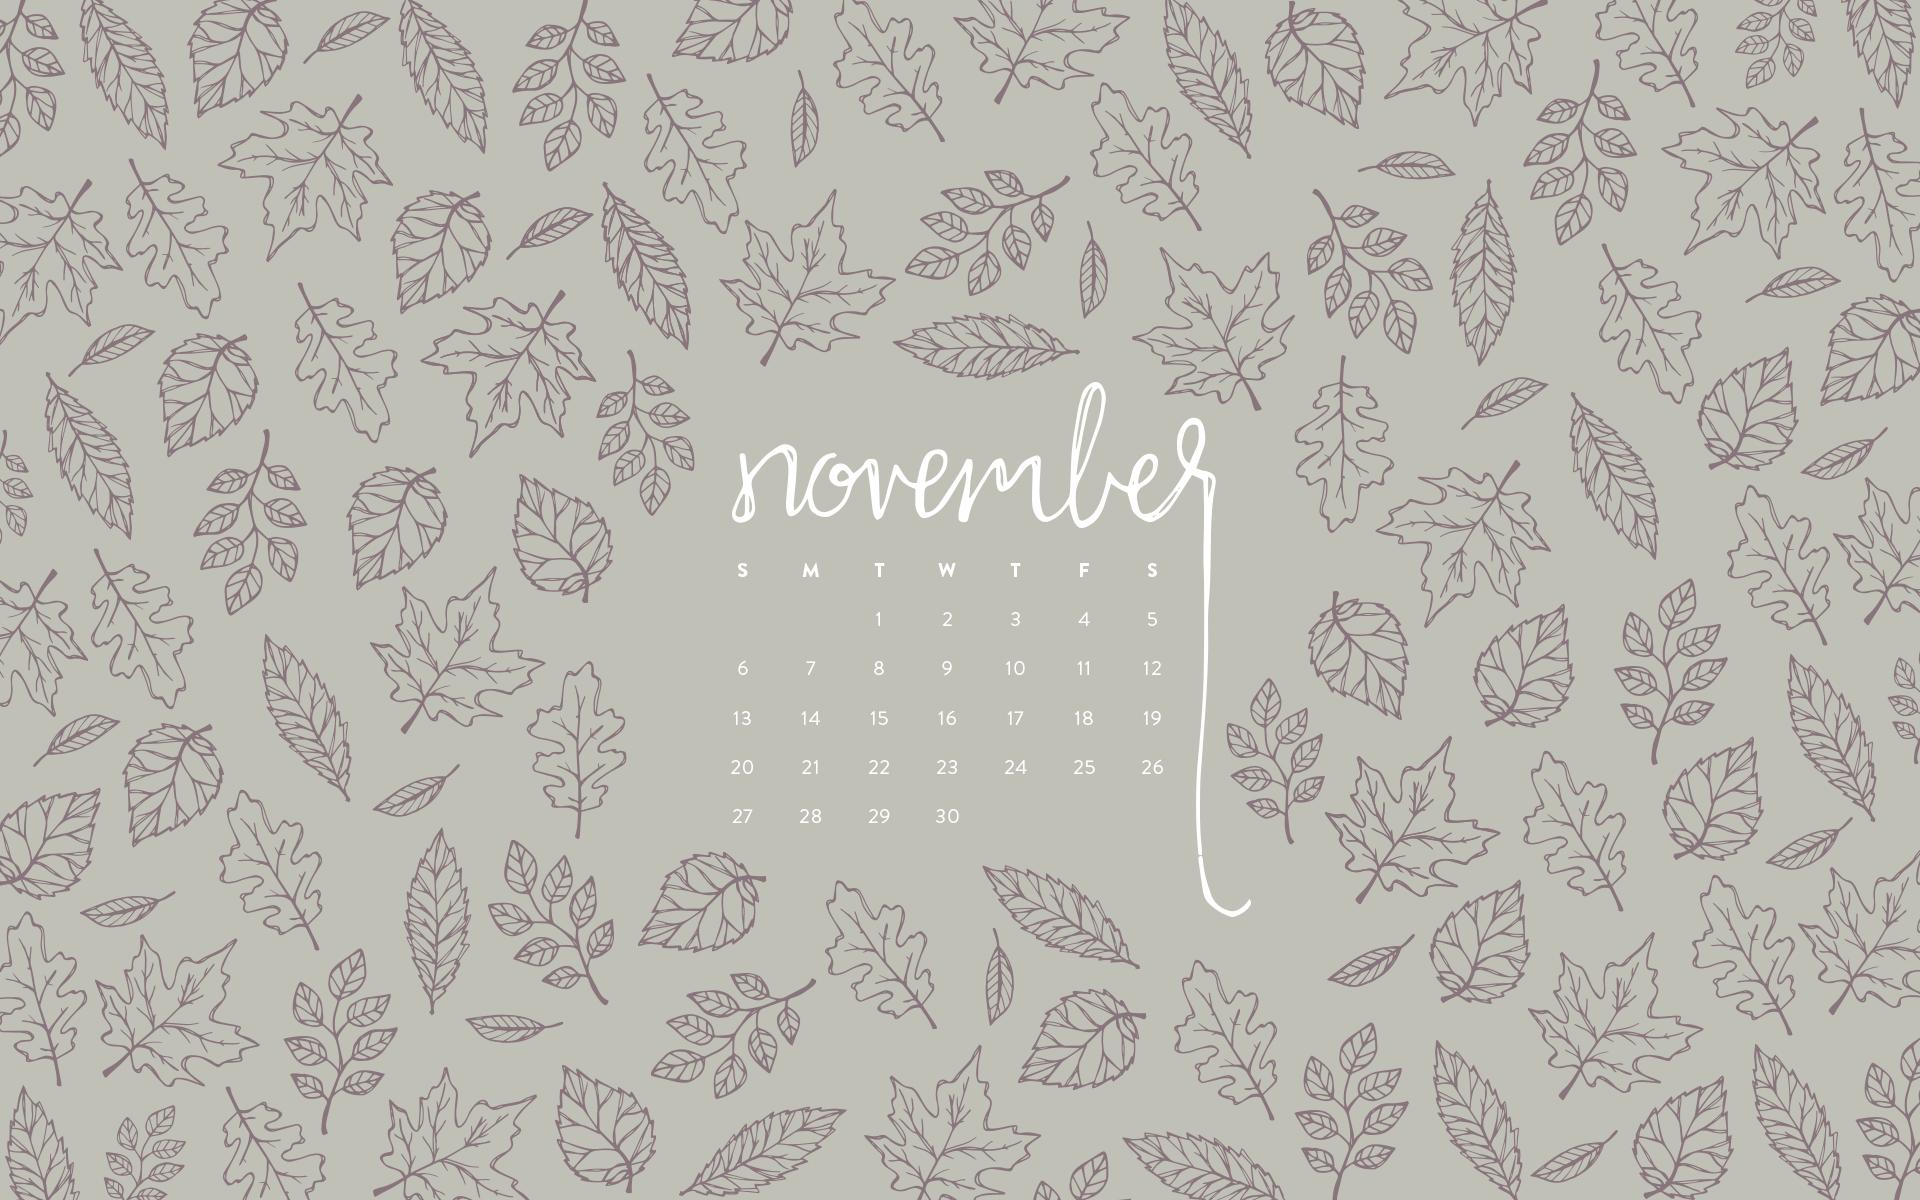 Marble Calendar Wallpaper November : Desktop wallpaper november calendar — britt fabello